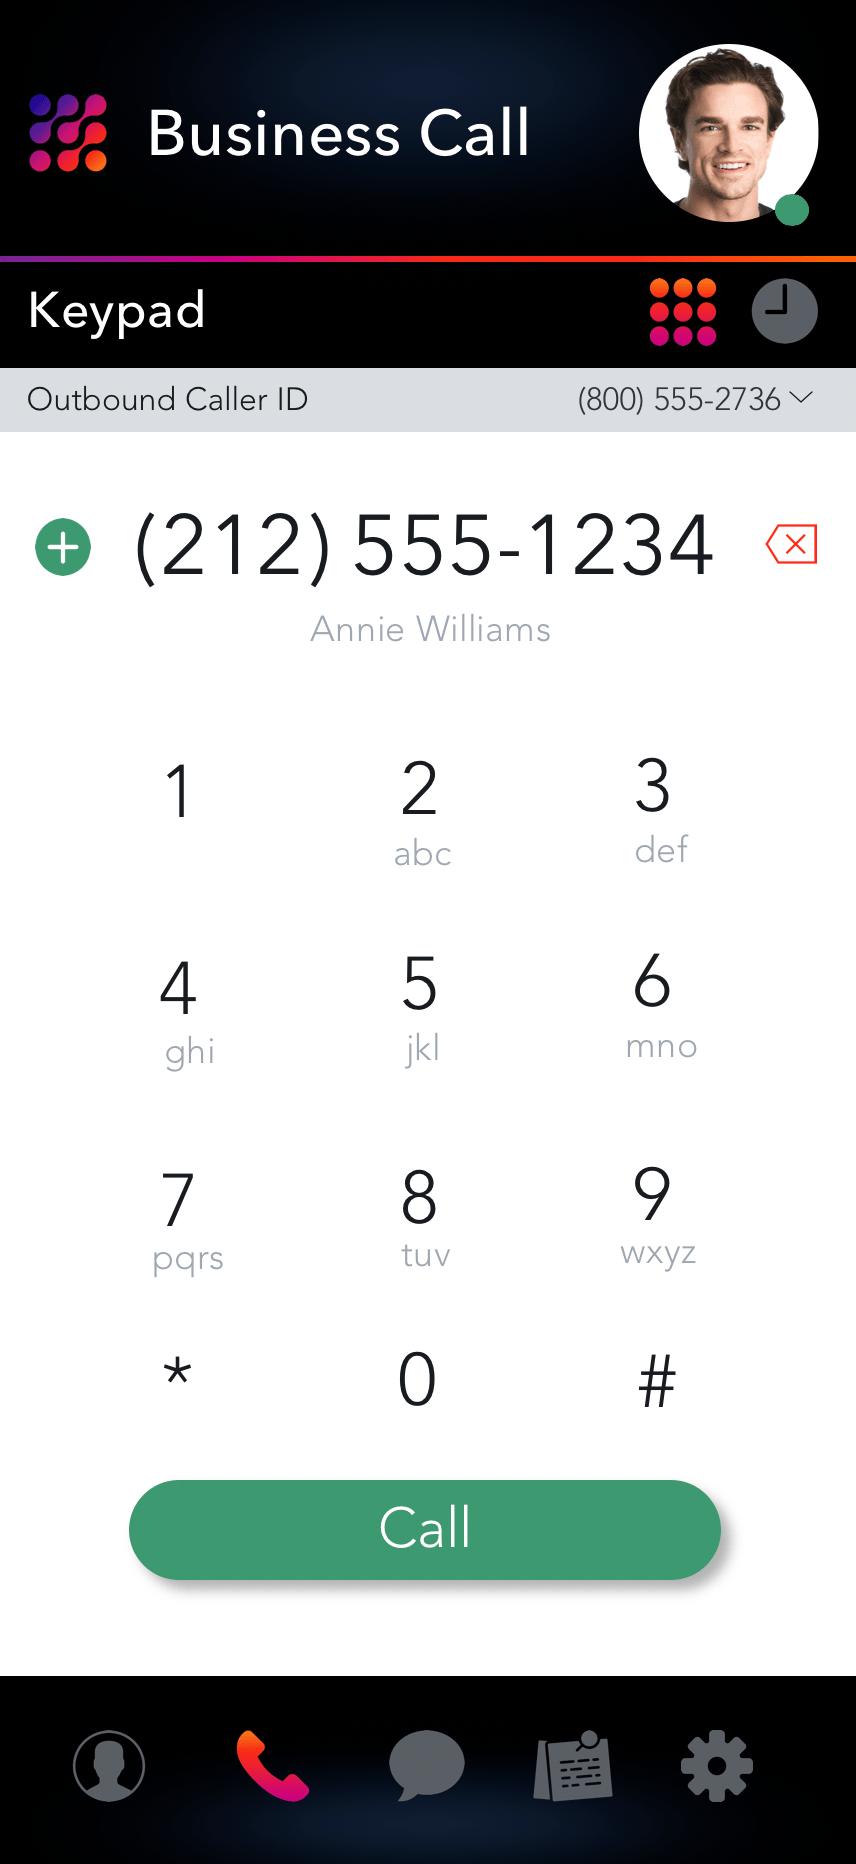 LinkedPhone Mobile App Screenshot of Phone Keypad and Business Caller ID